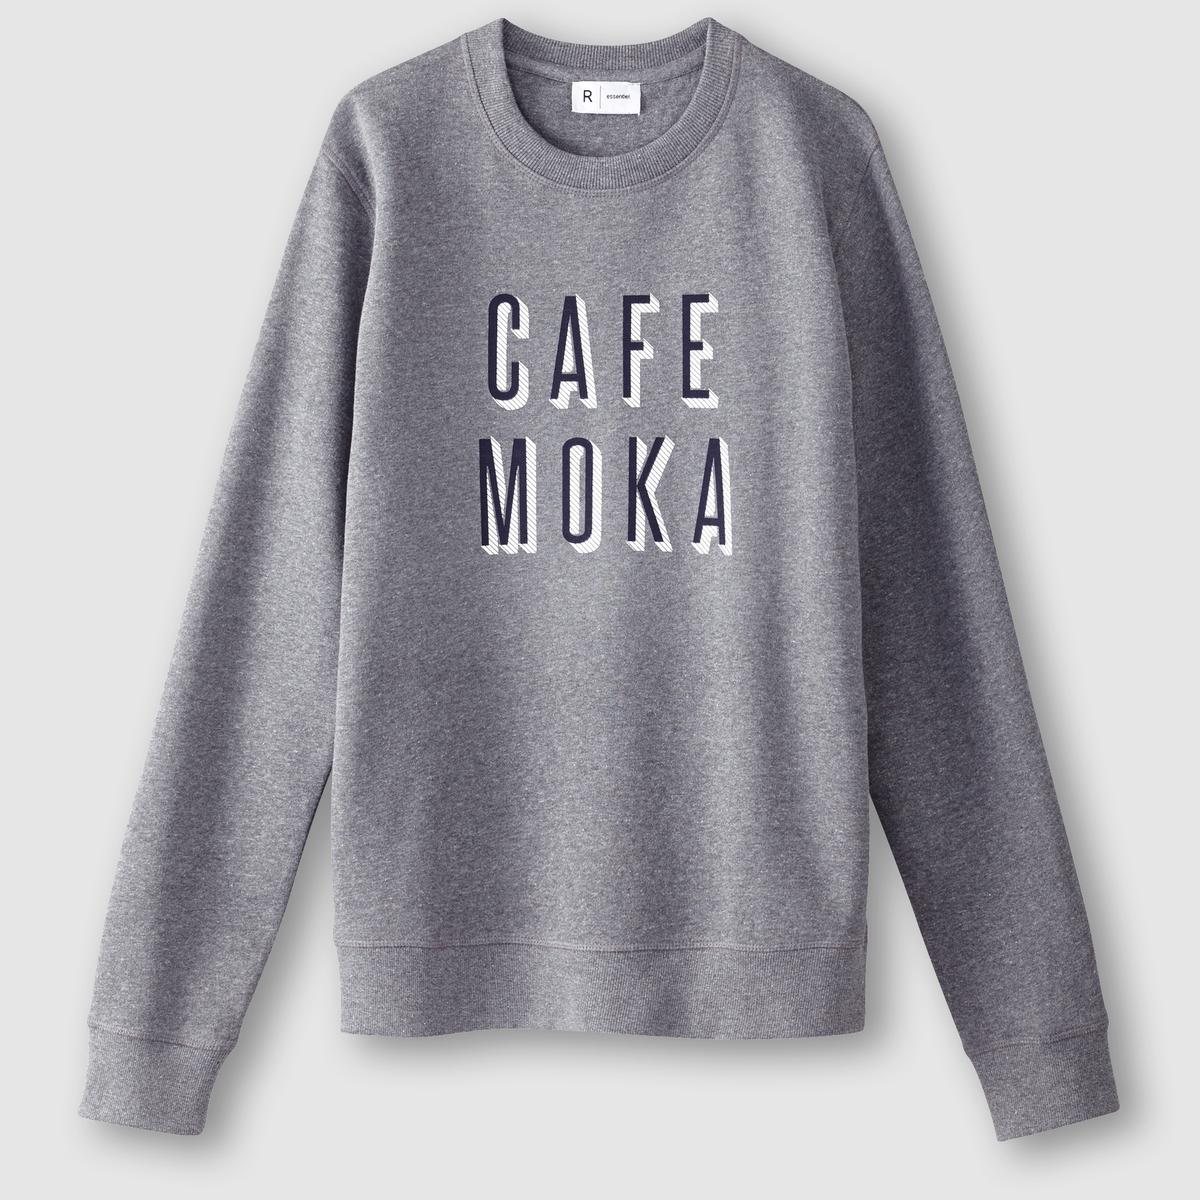 Свитшот с рисунком Cafe Moka